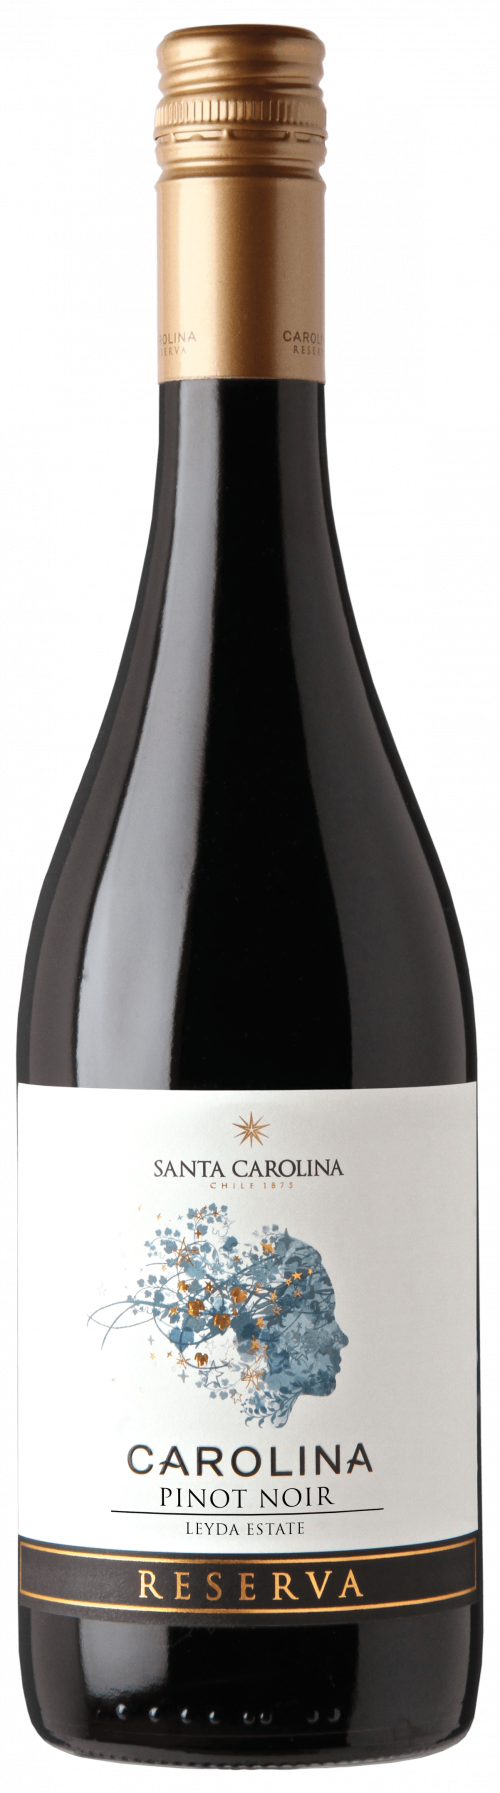 2019 Santa Carolina Reserva Pinot Noir 750ml